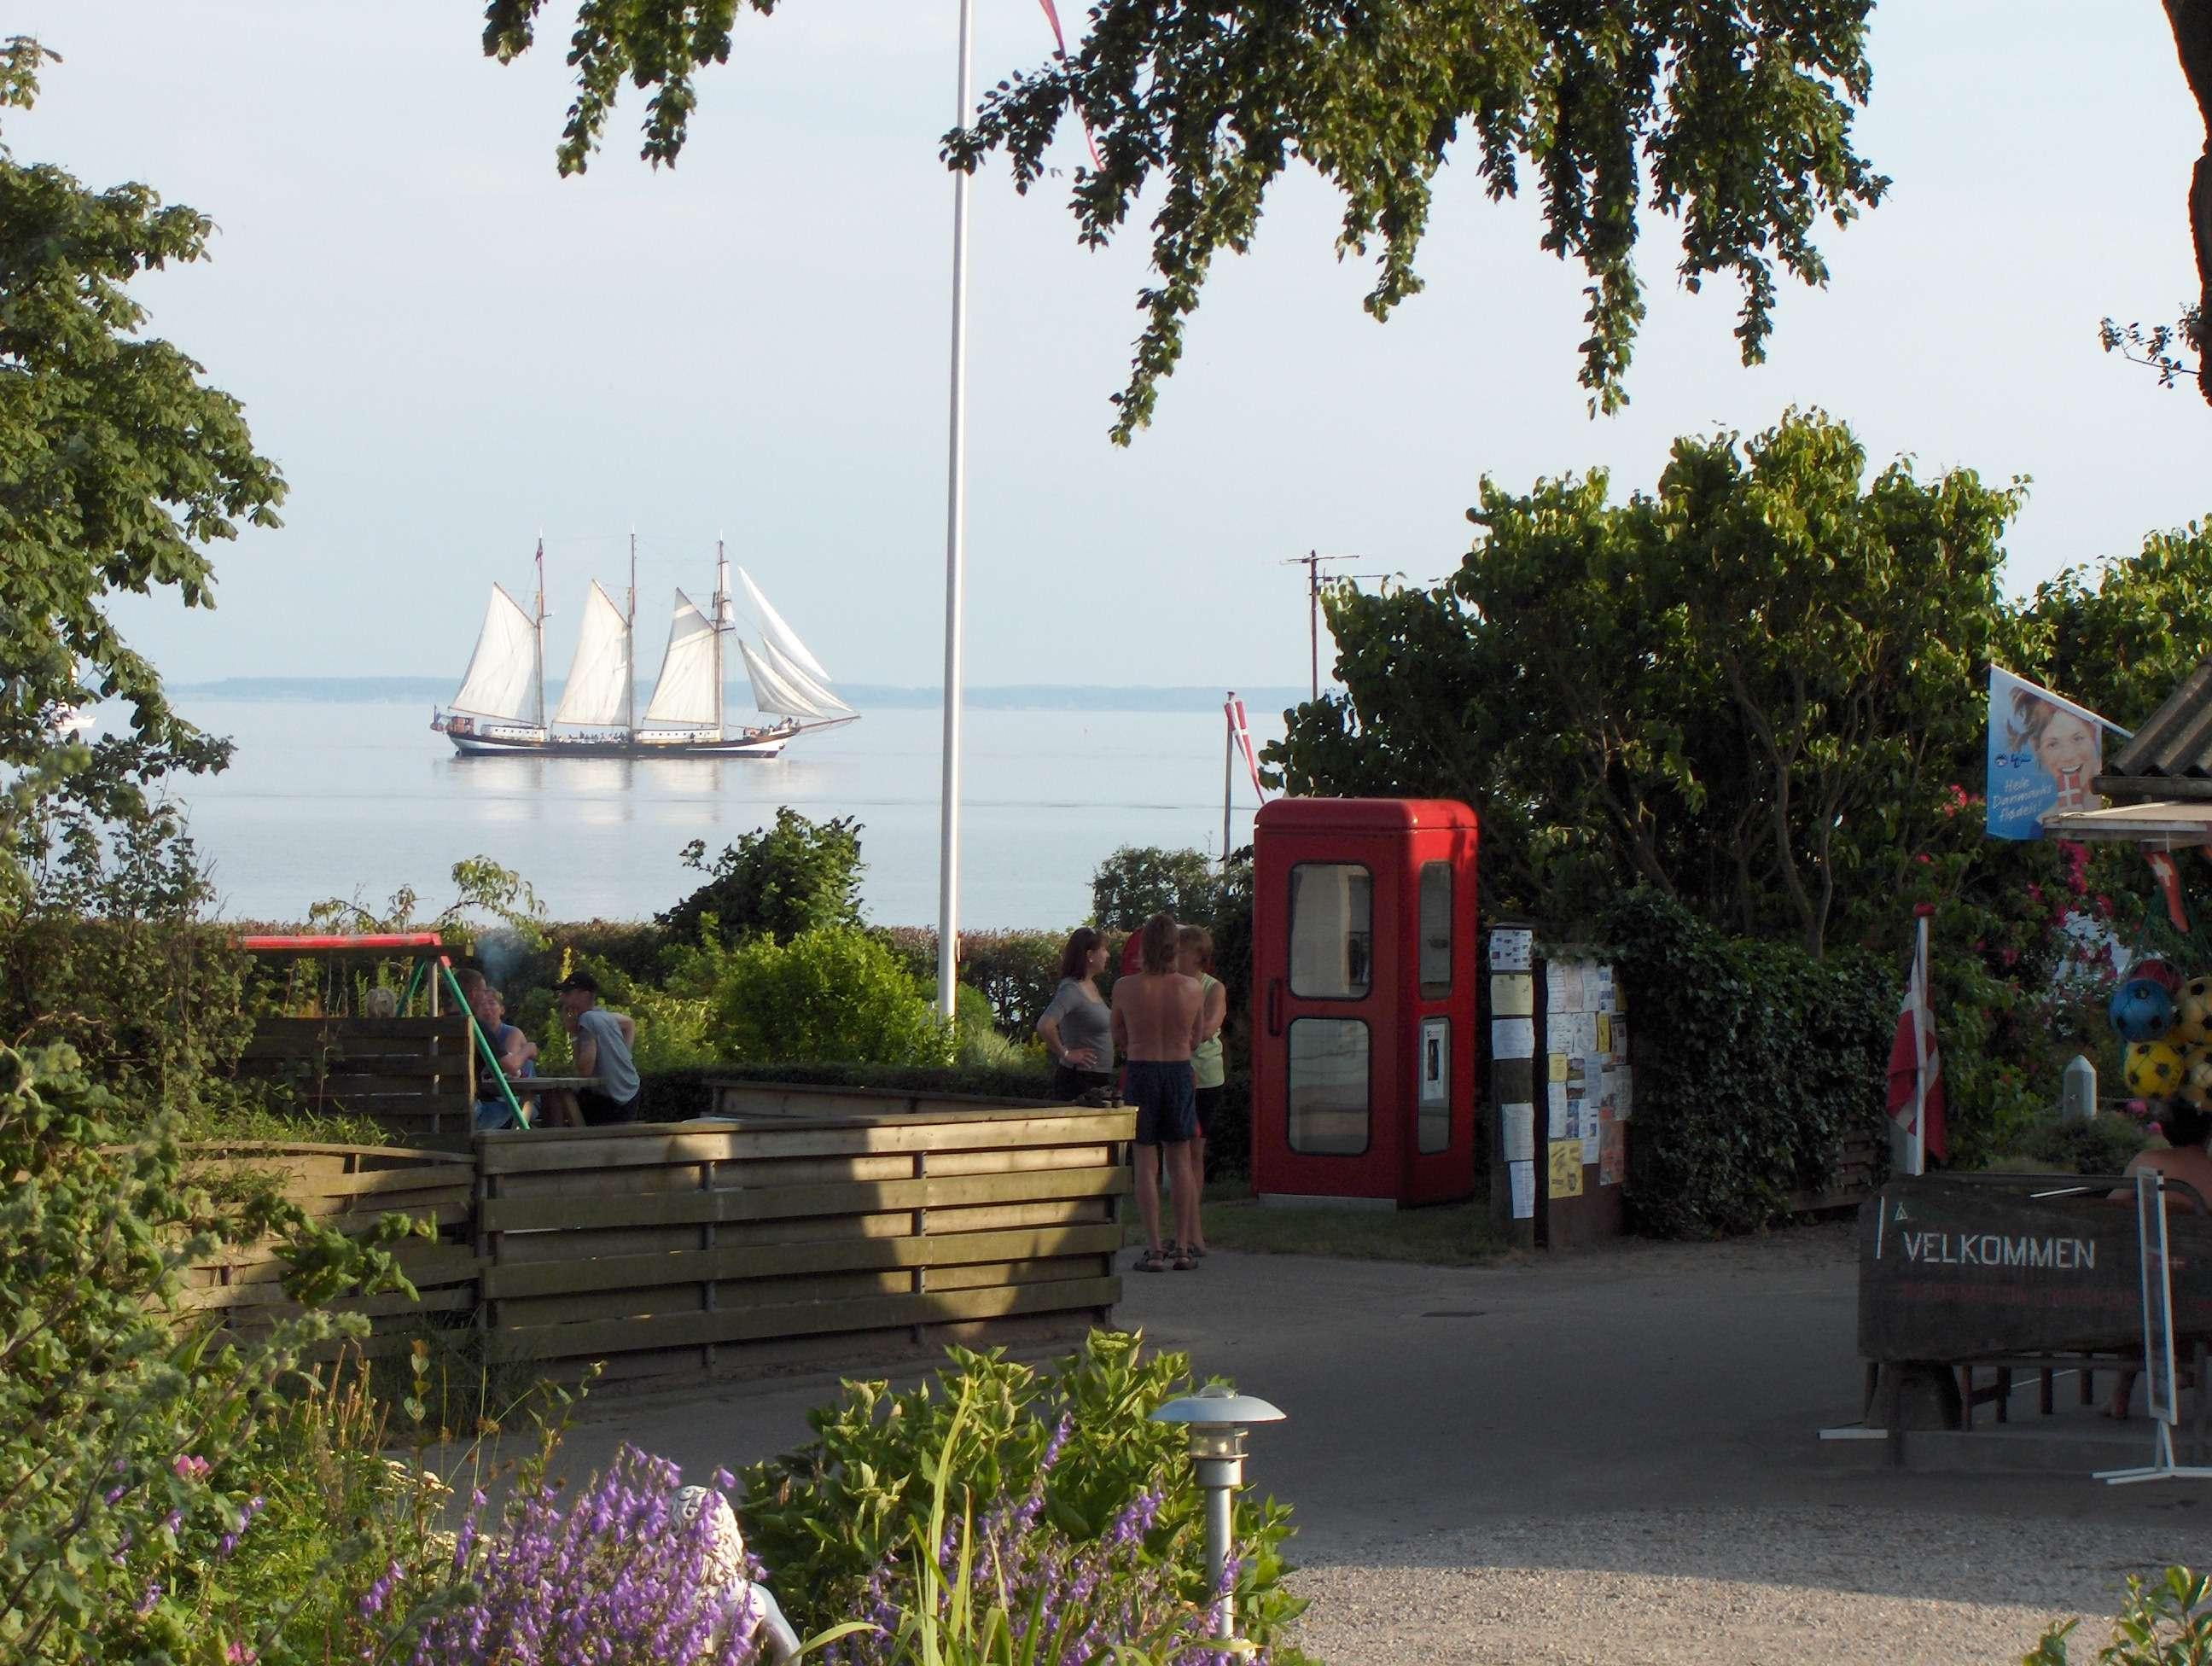 sonderby strand camping dk